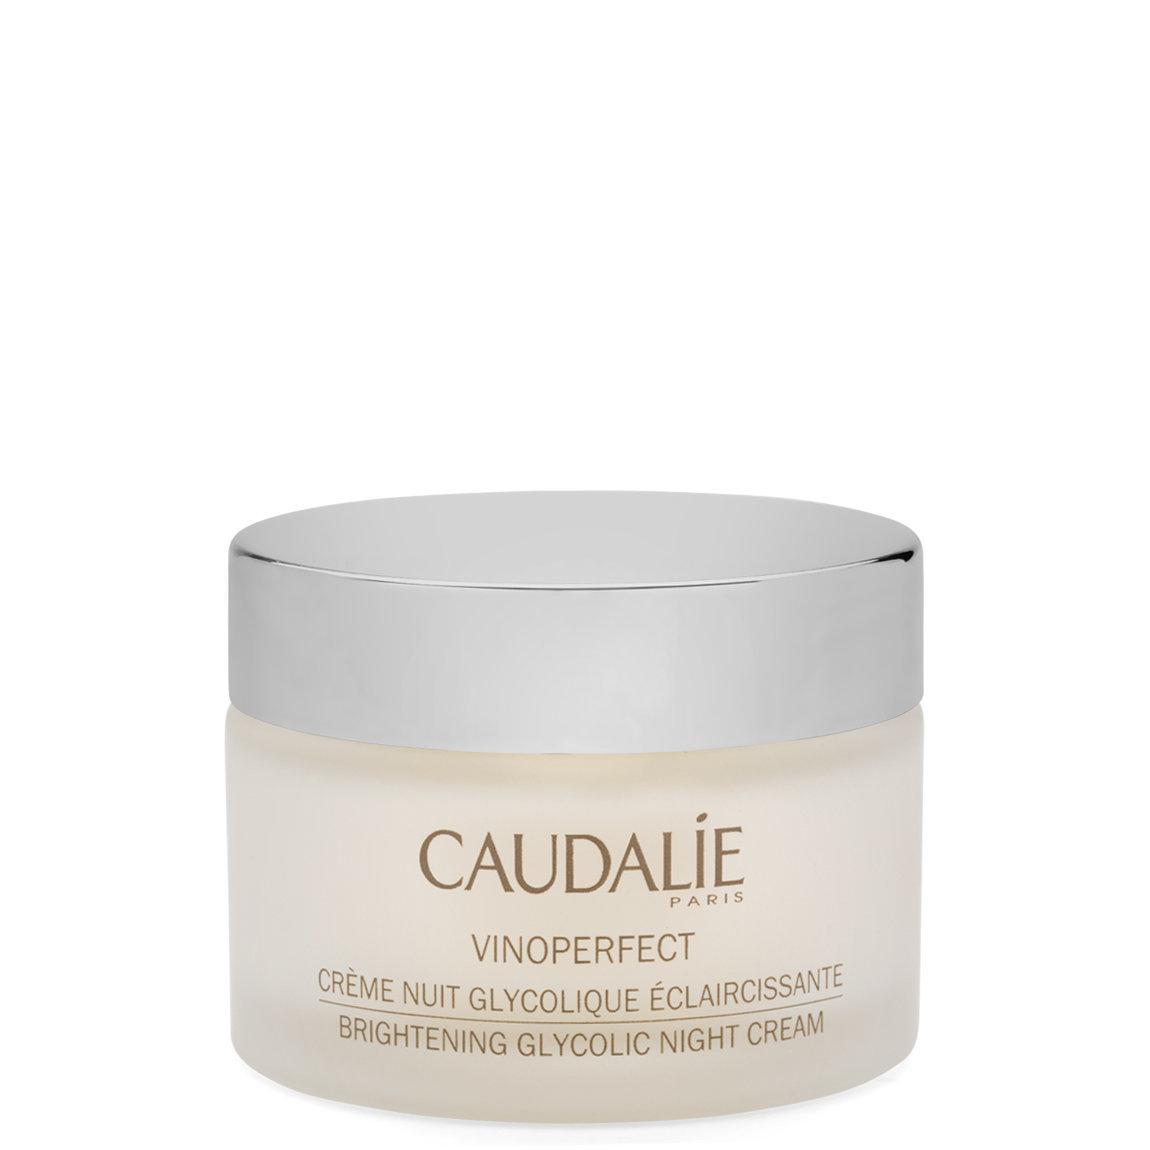 Caudalie Vinoperfect Brightening Glycolic Night Cream product swatch.